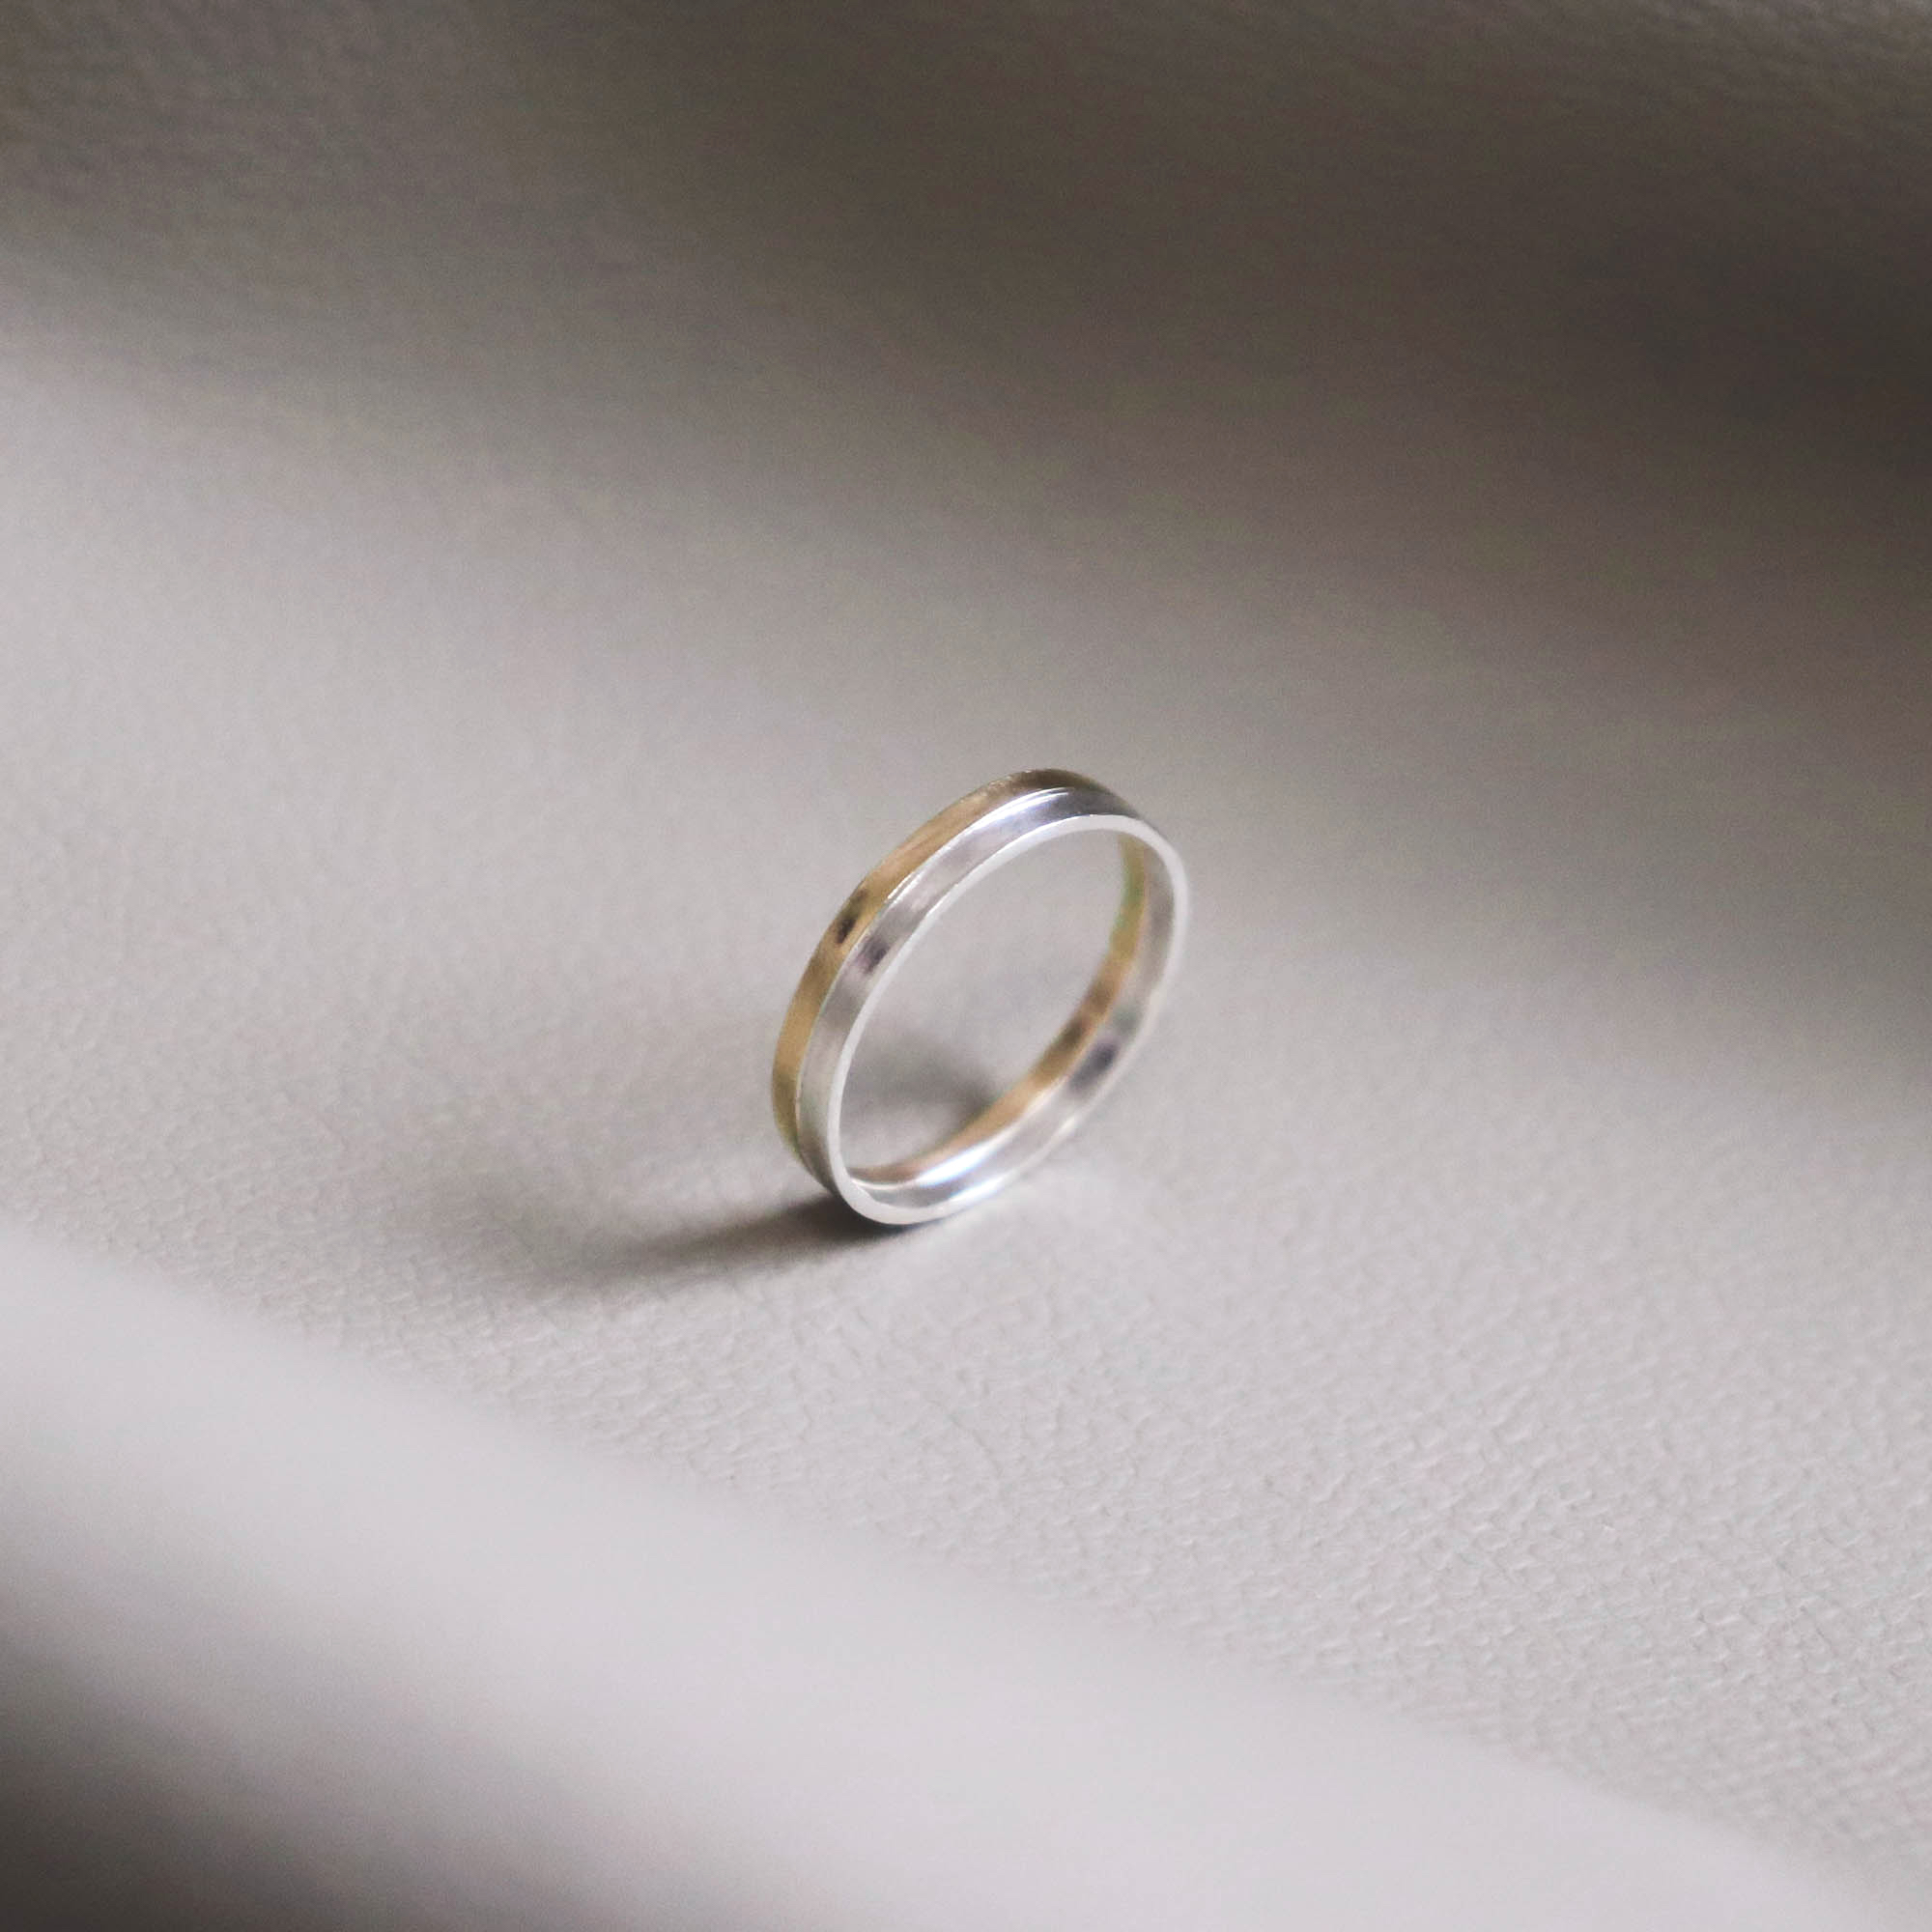 Copy of two tone wedding band ring -studiocosette